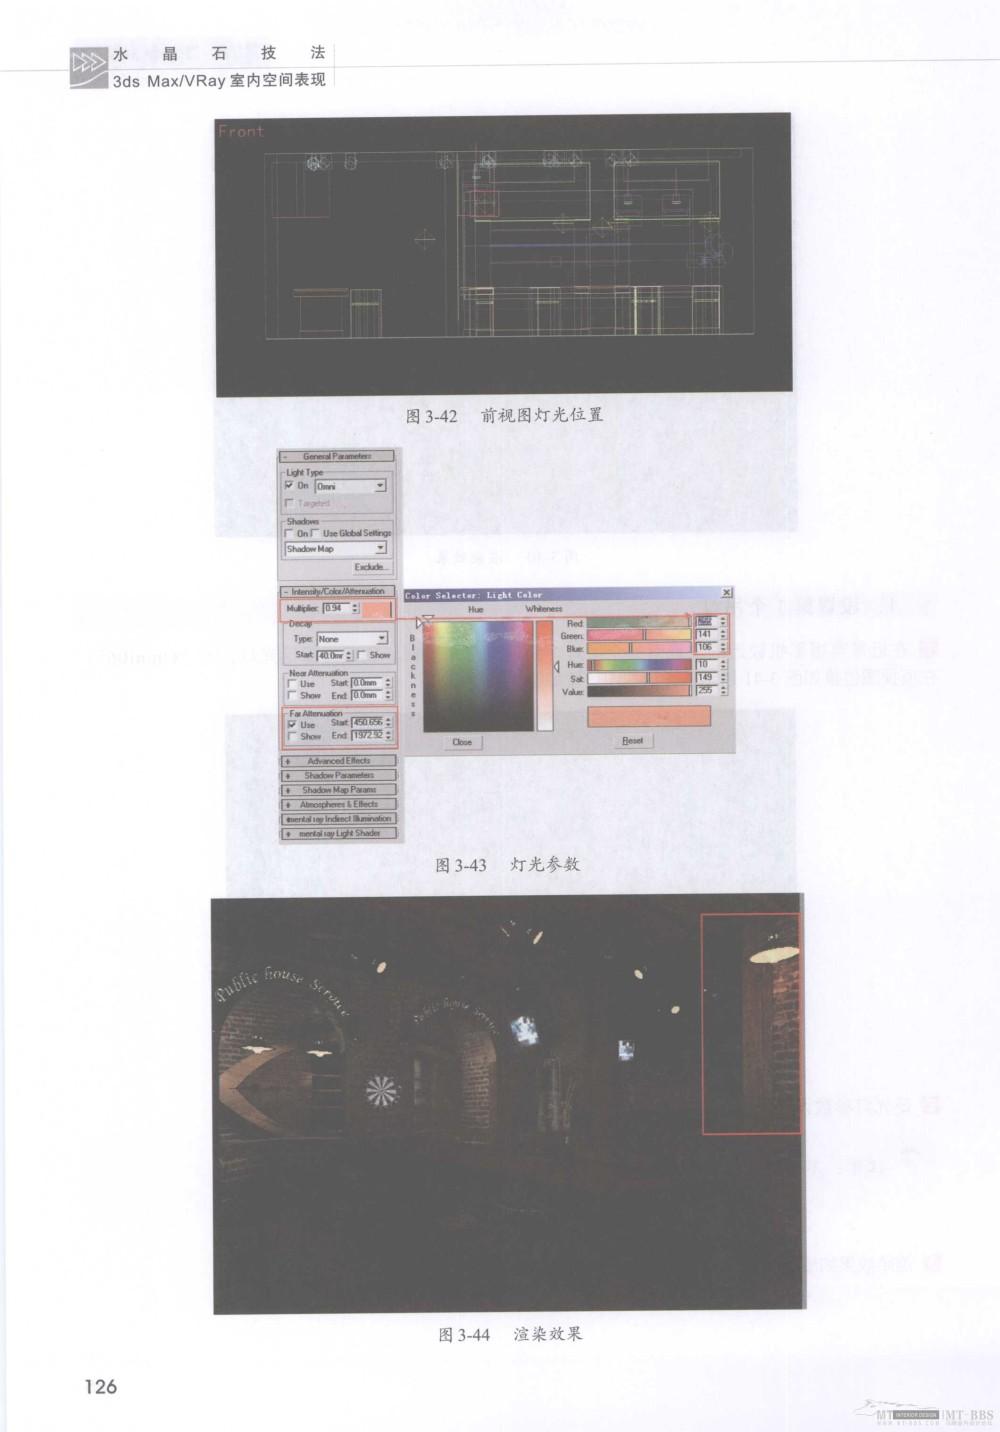 水晶石技法-3ds_Max&VRay室内空间表现_水晶石技法-3ds_Max&VRay室内空间表现_页面_132.jpg